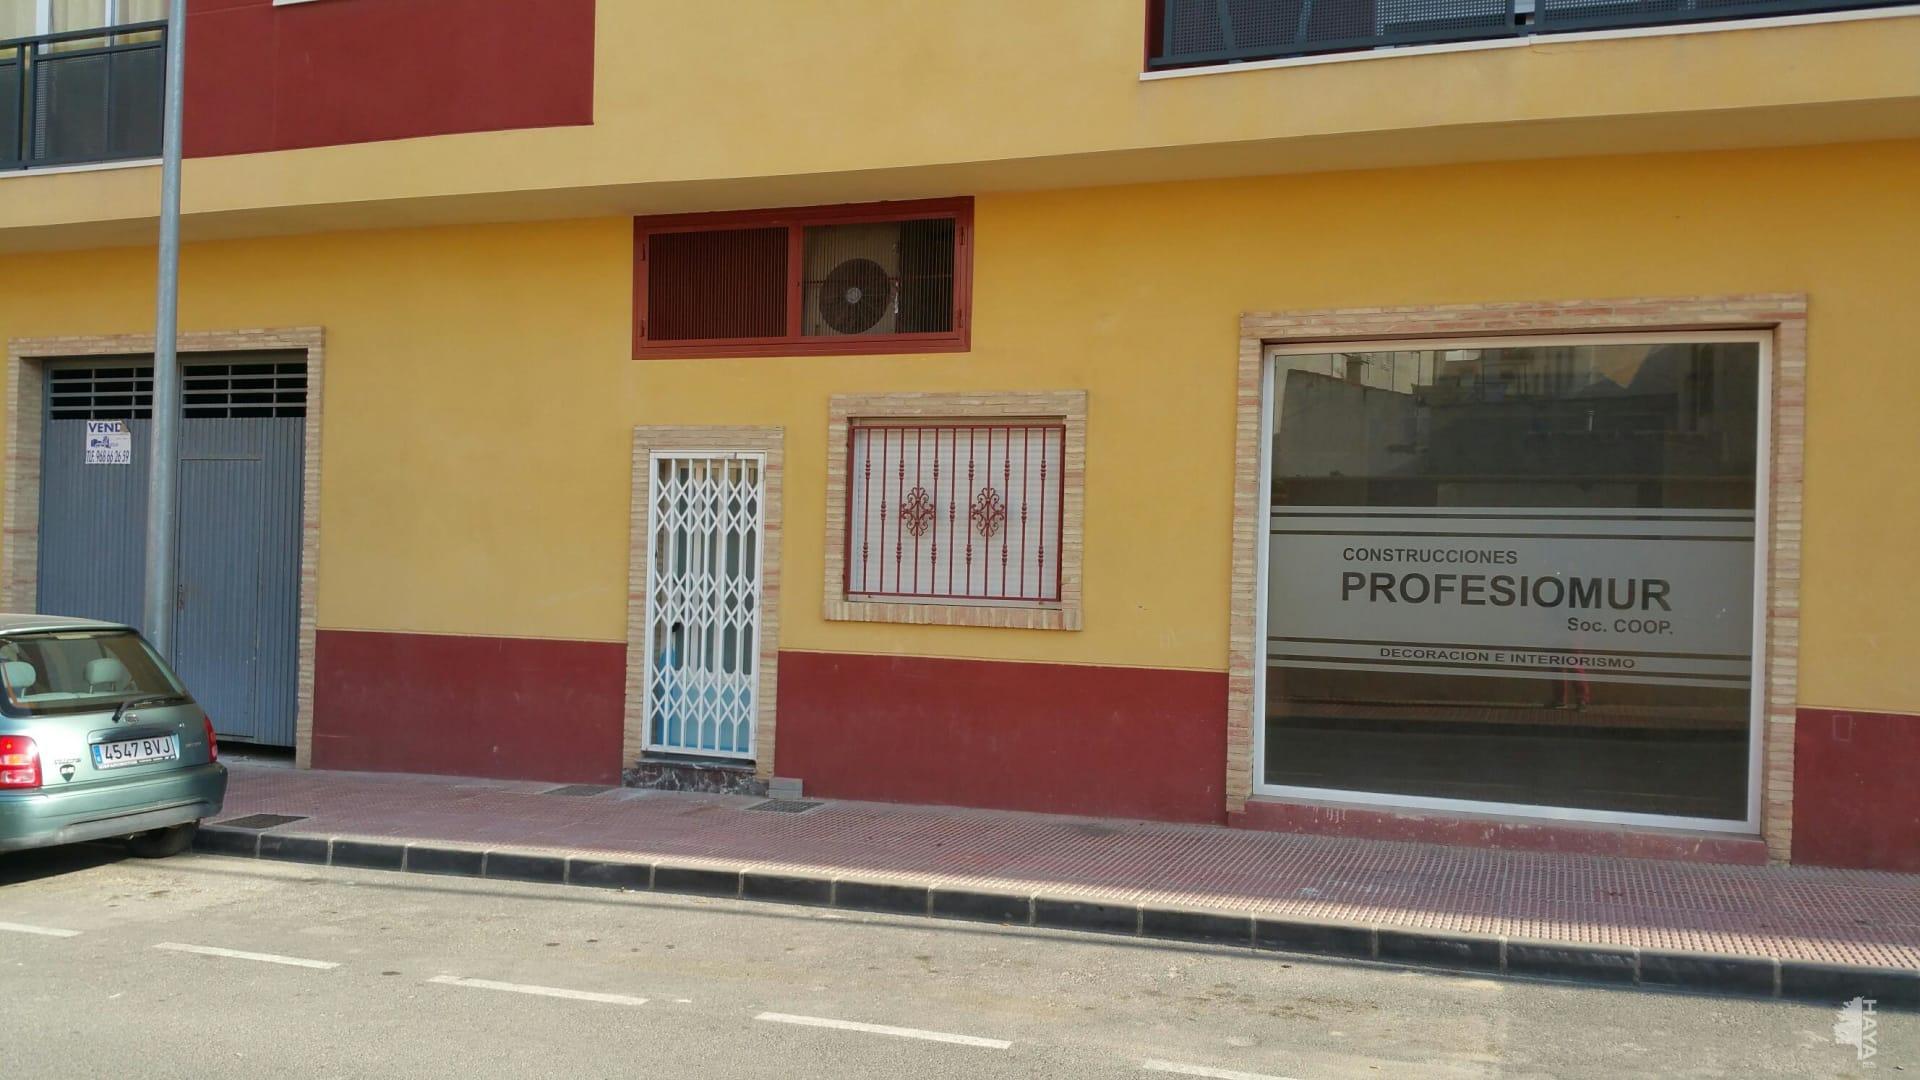 Local en venta en Mula, Murcia, Camino San Sebastian, 105.100 €, 421 m2